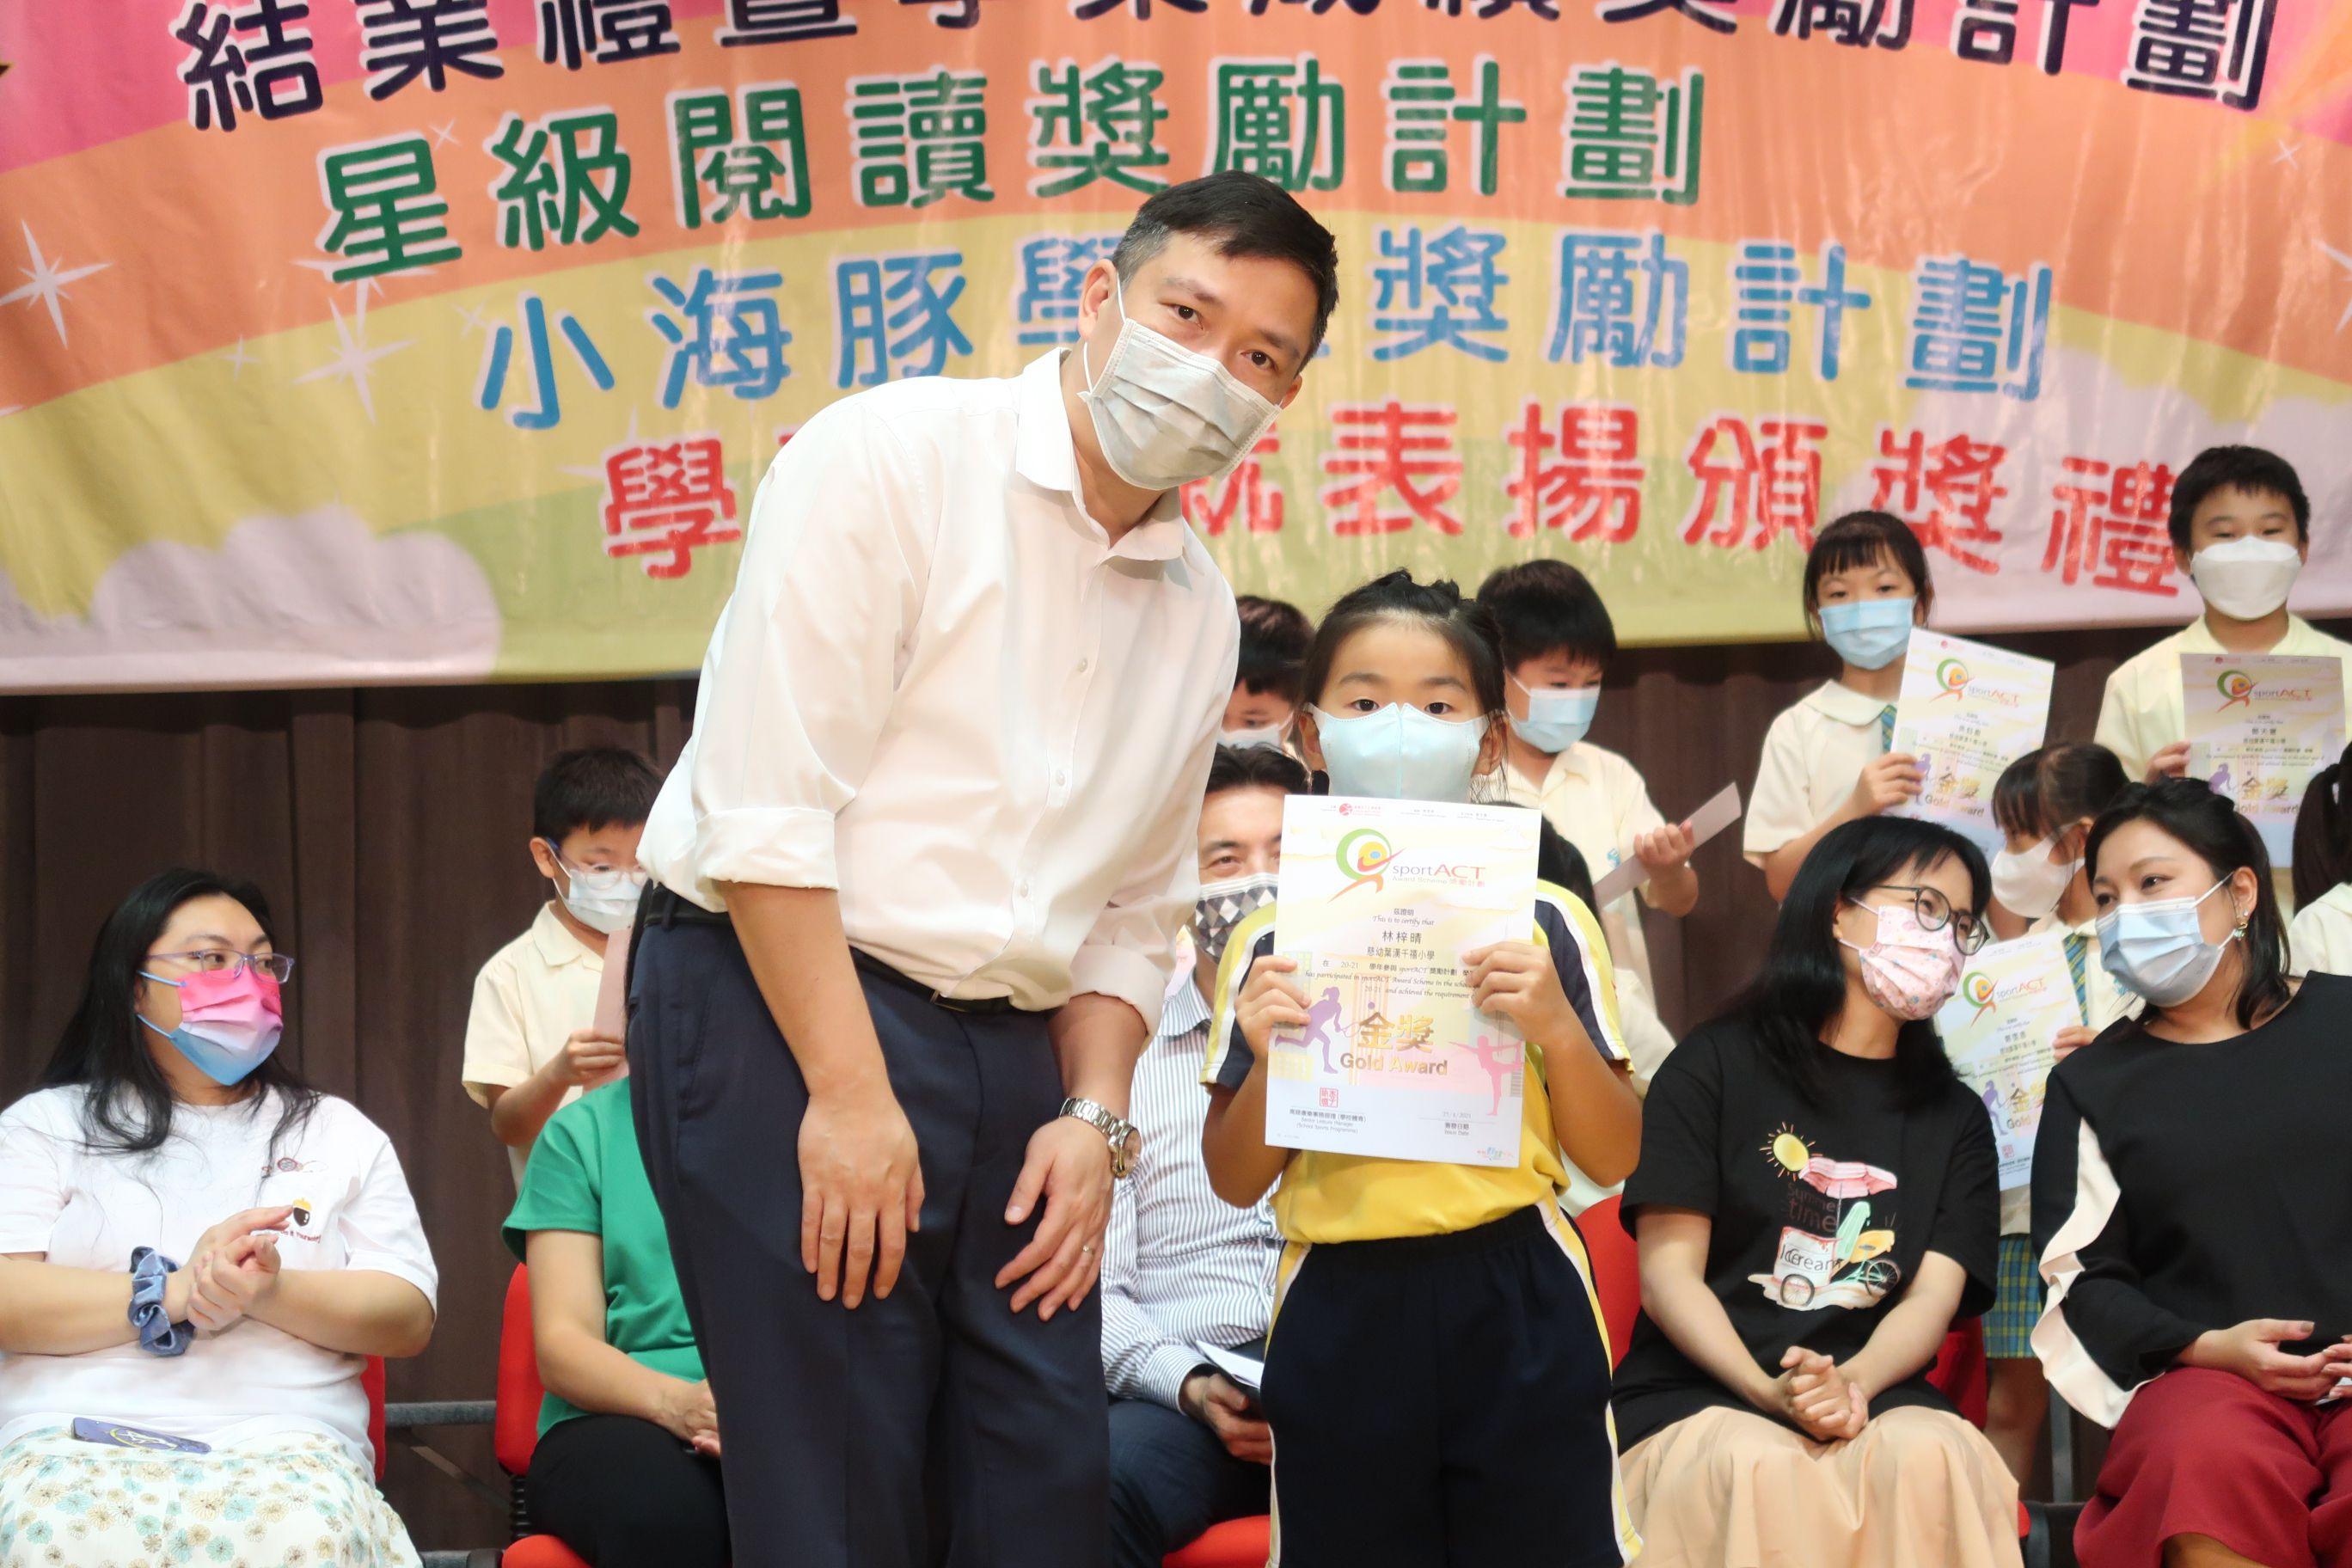 https://syh.edu.hk/sites/default/files/img_5906.jpg